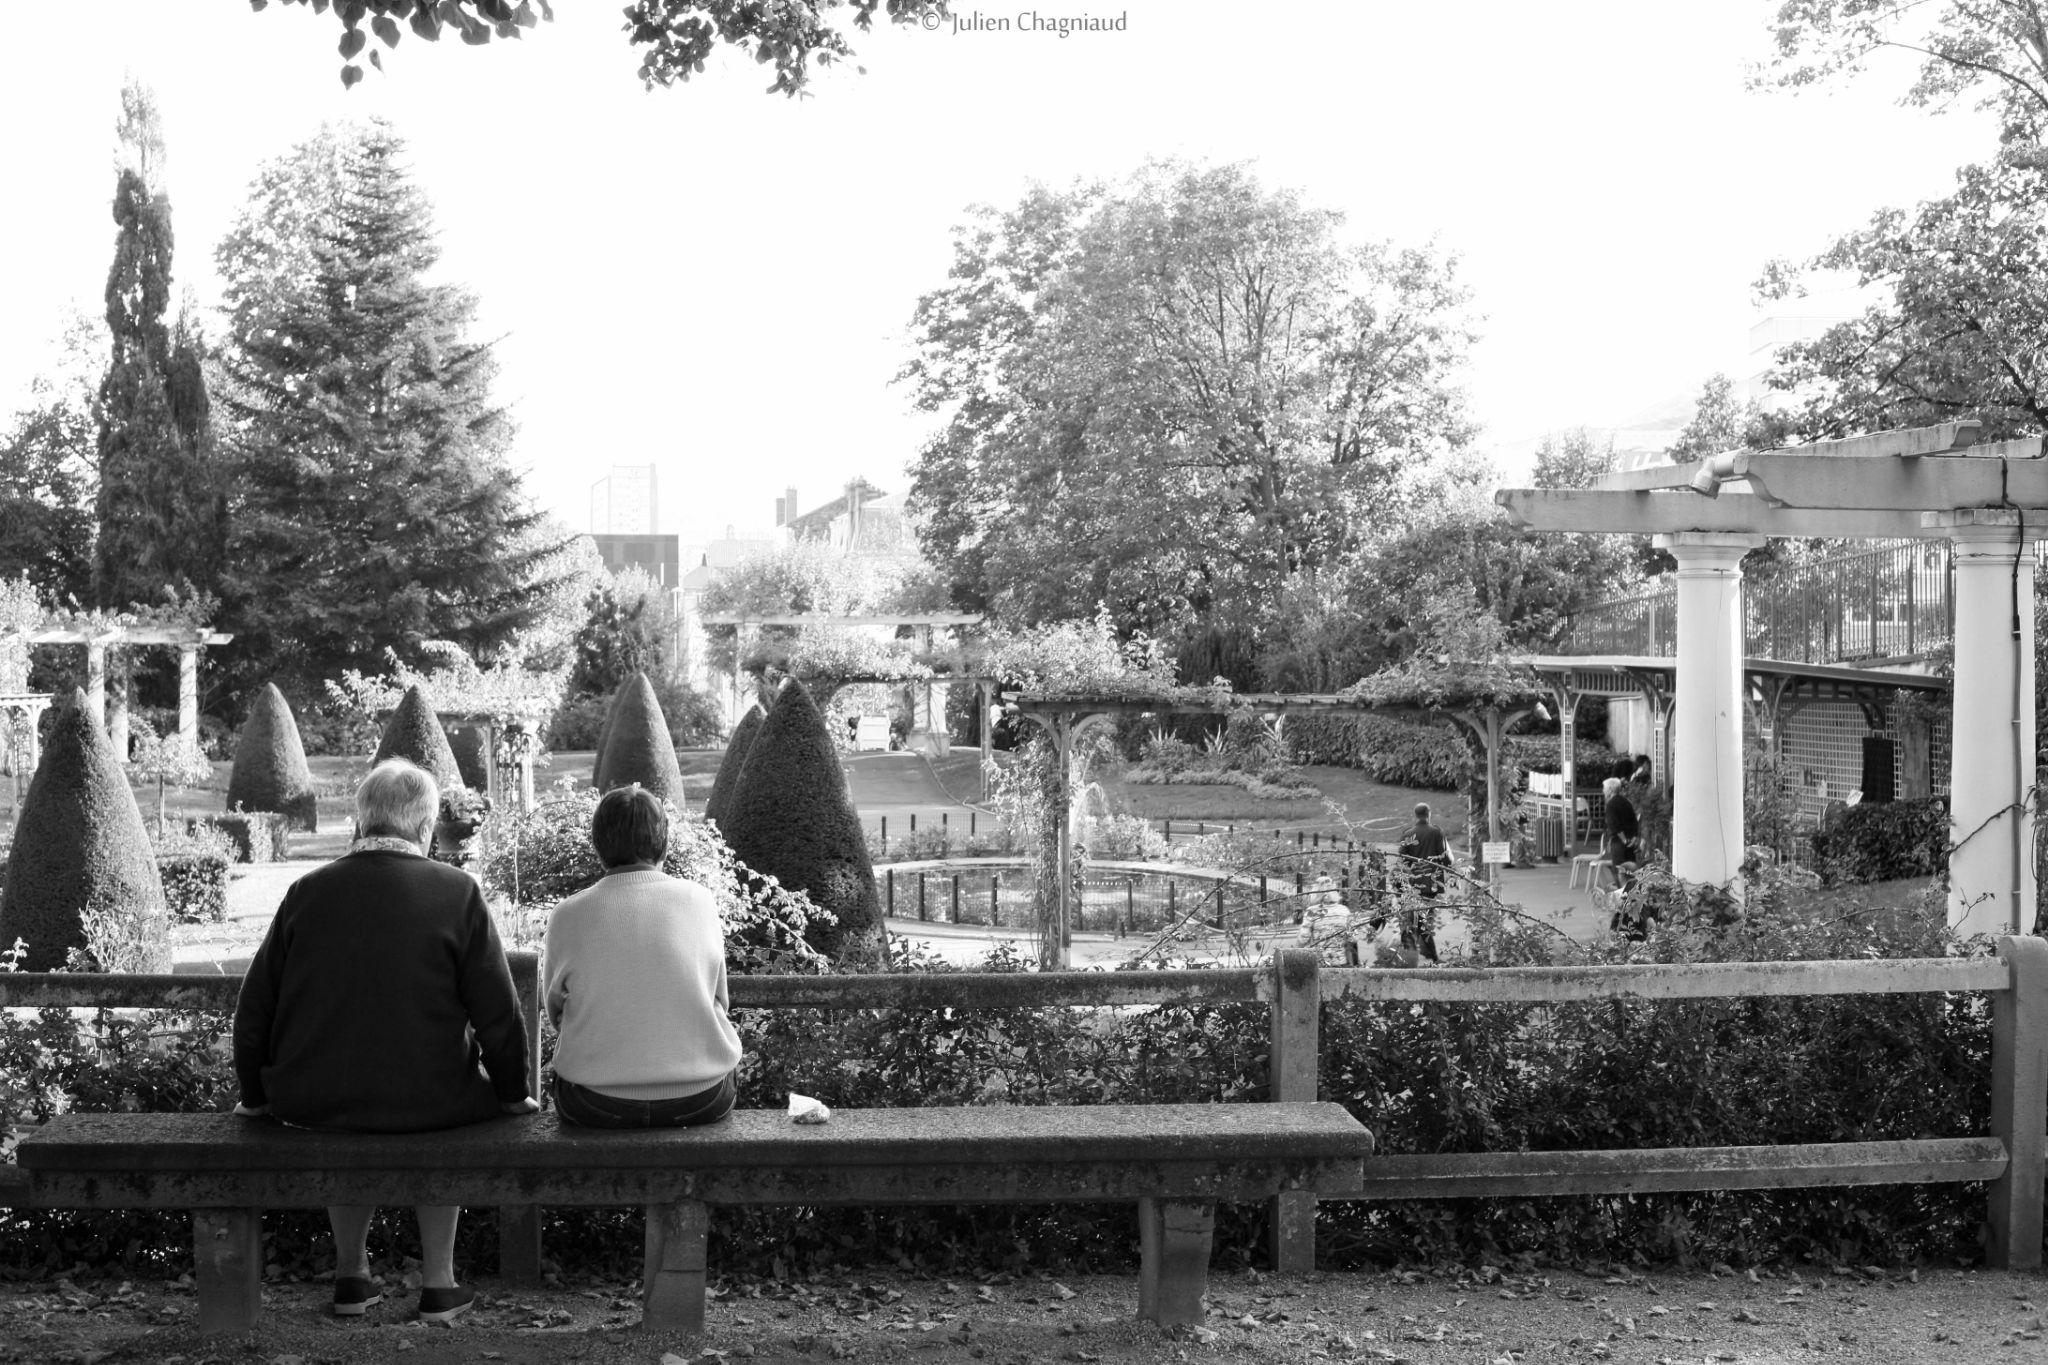 Watching the garden by Julien Chagniaud